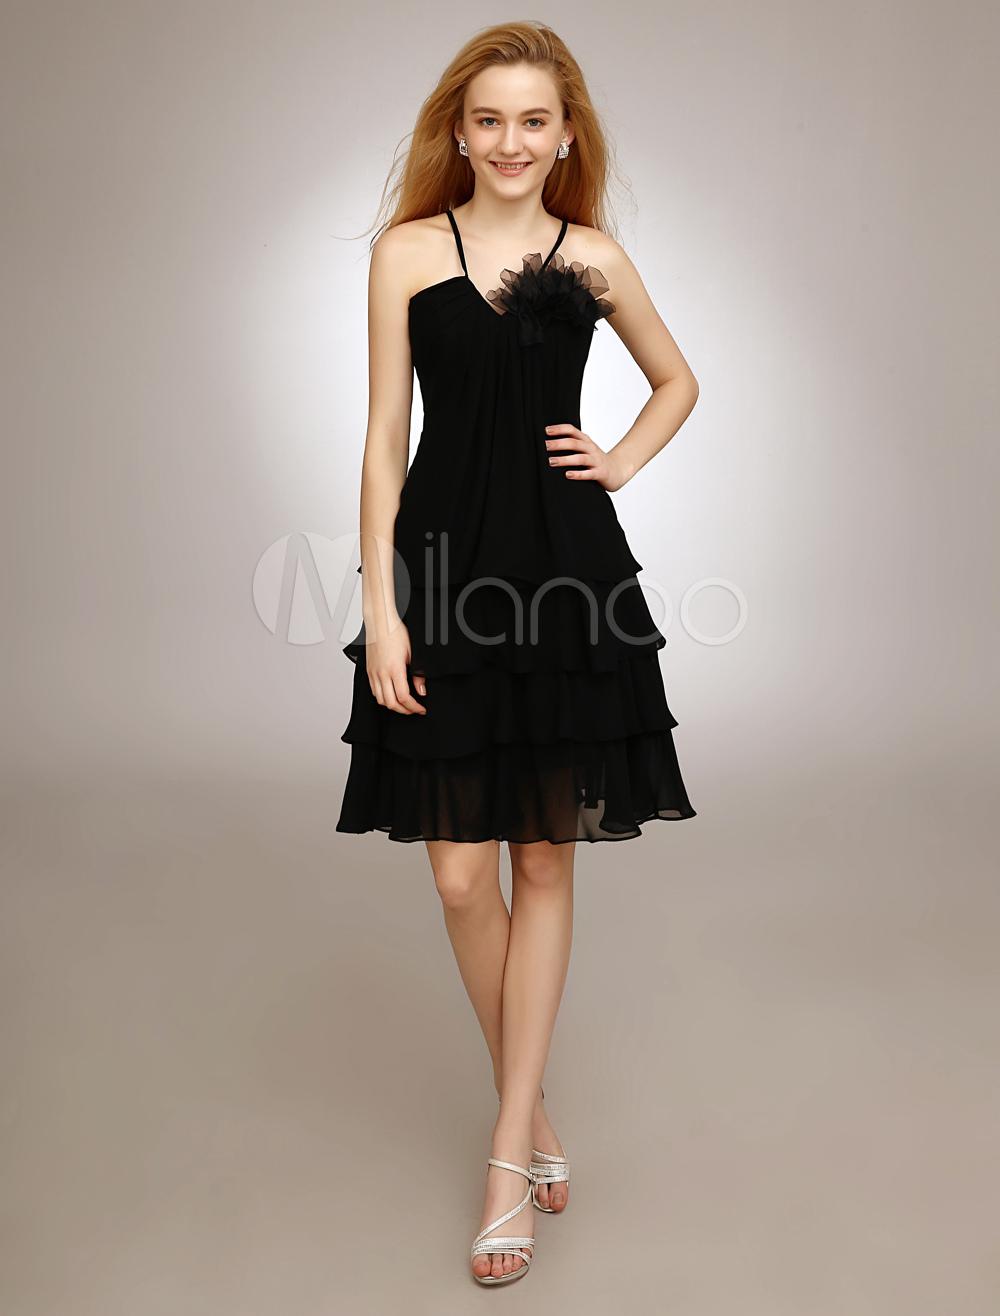 Black V-Neck Bridesmaid Dress With Tiered Chiffon (Wedding Bridesmaid Dresses) photo